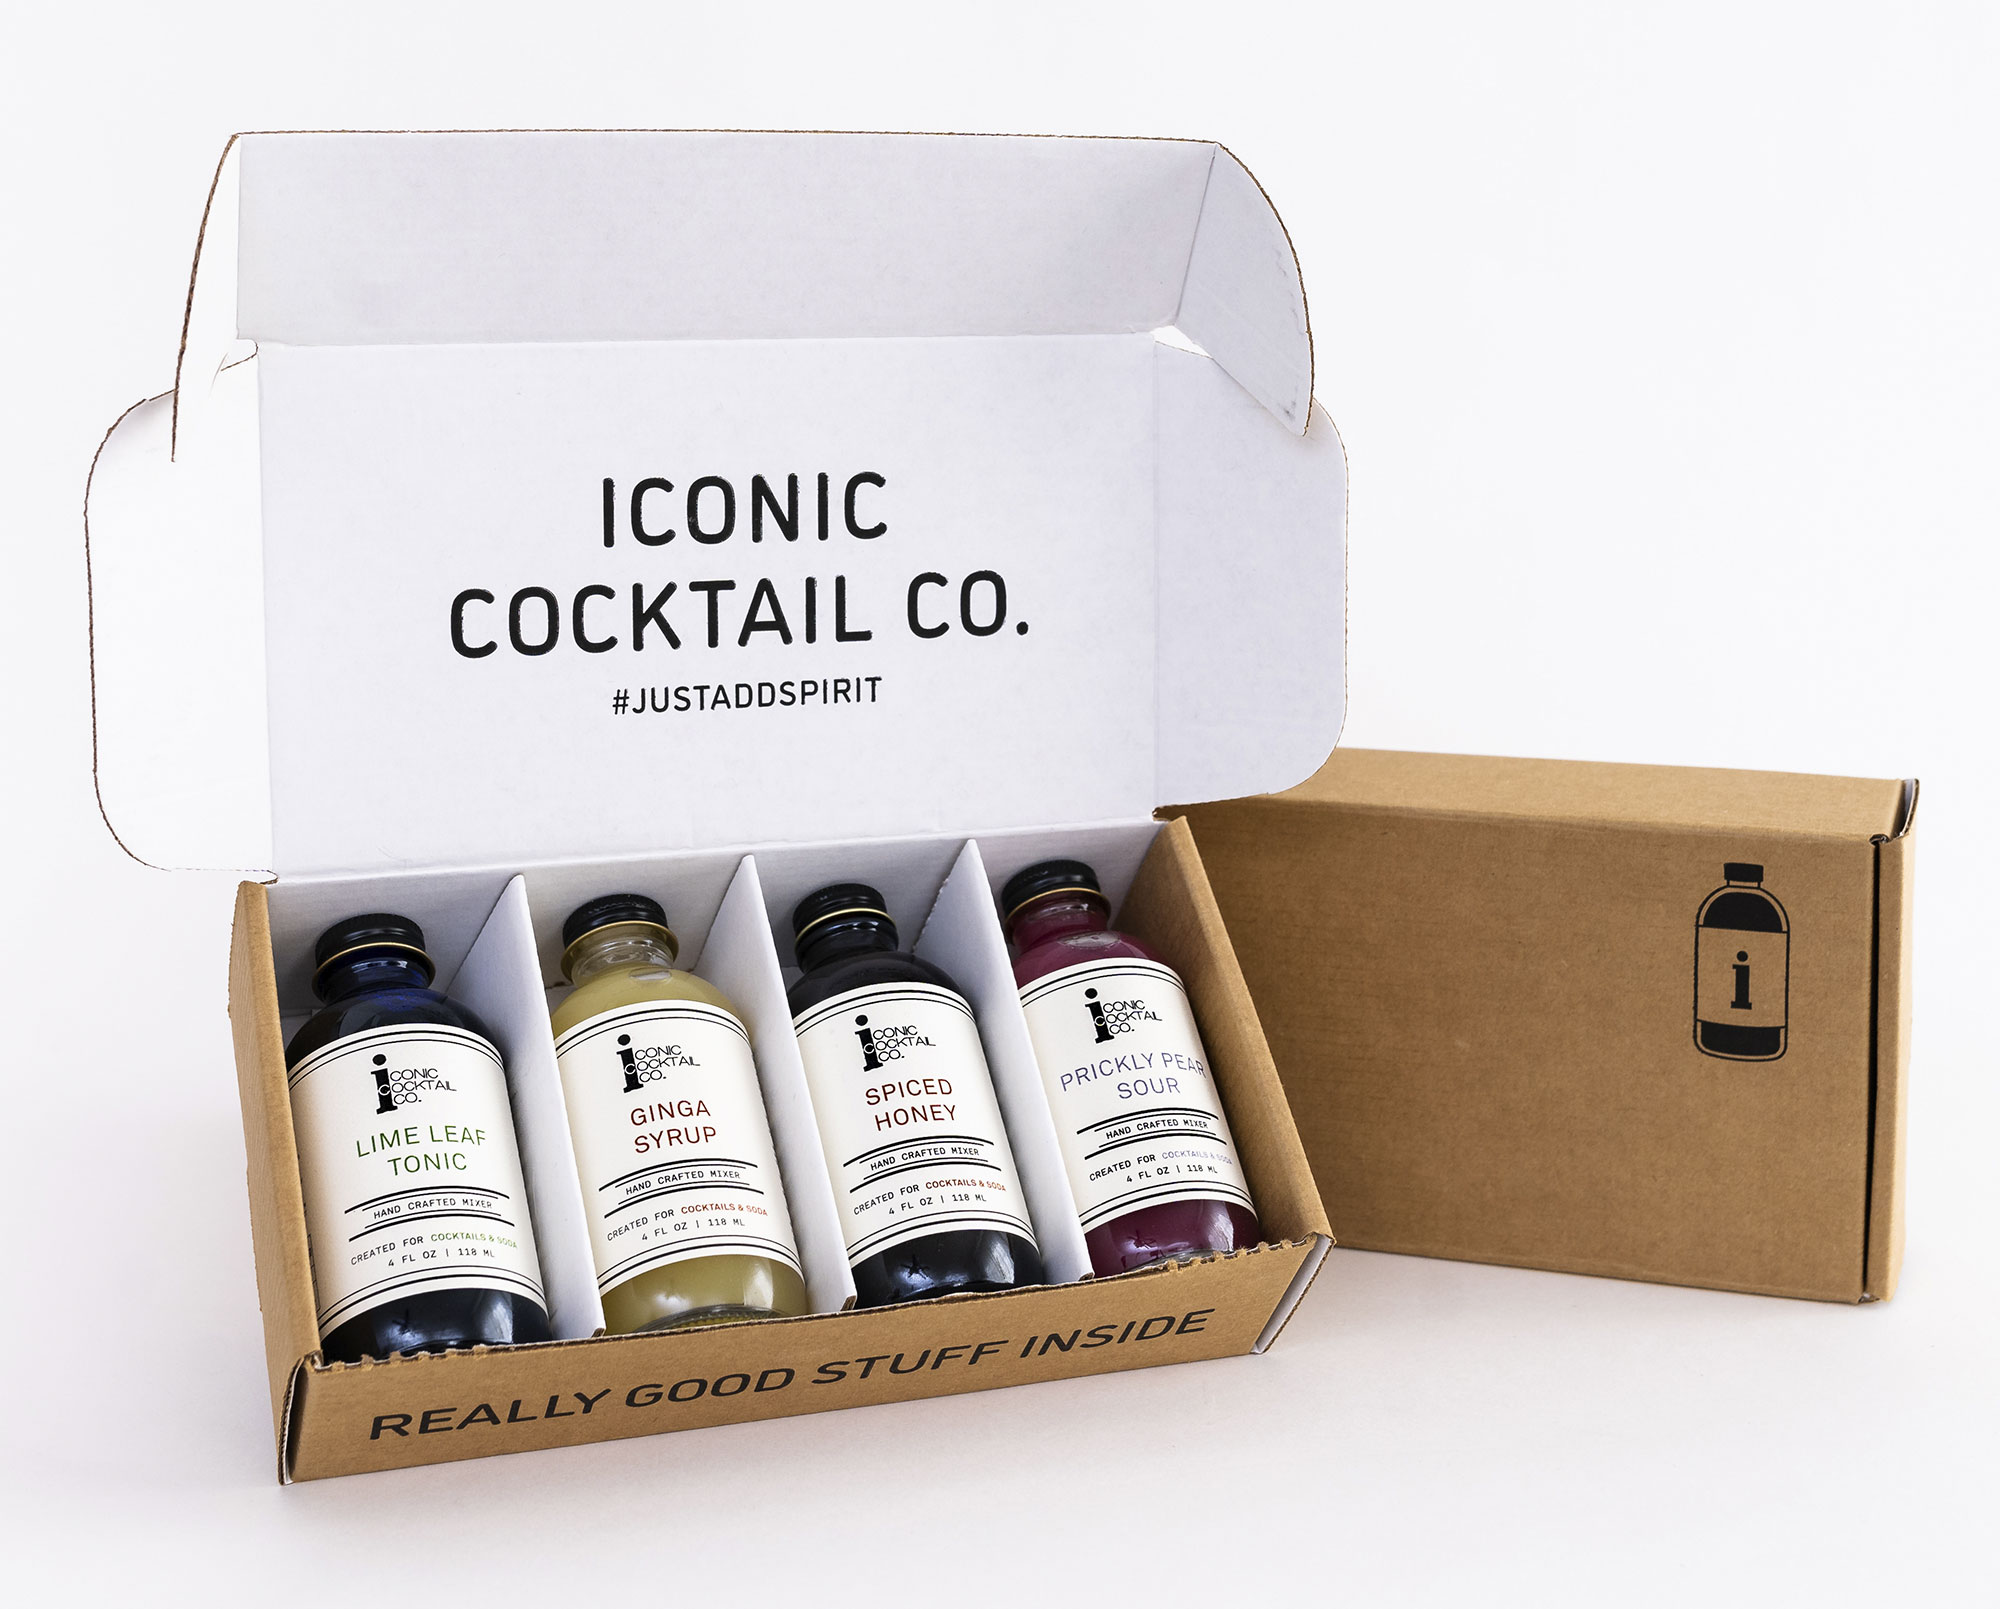 https://www.phoenixmag.com/wp-content/uploads/2021/07/PHM0821_BOV_Iconic-Cocktail-Bottles-2020-White-Background_11.jpg